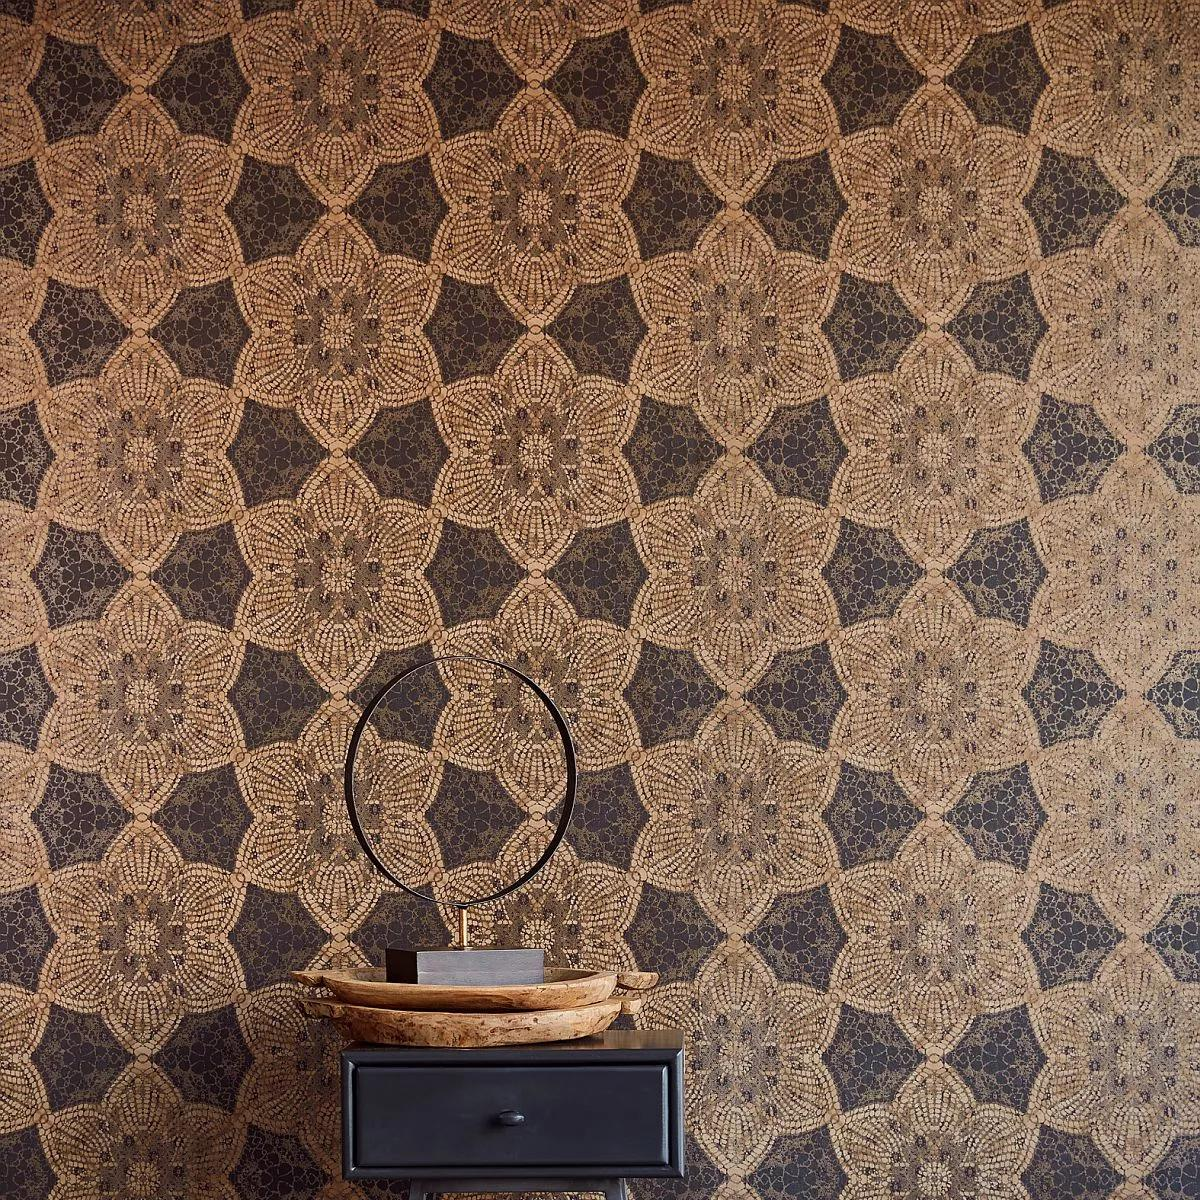 Luxus tapéta afrikai stílusban orientális mintával